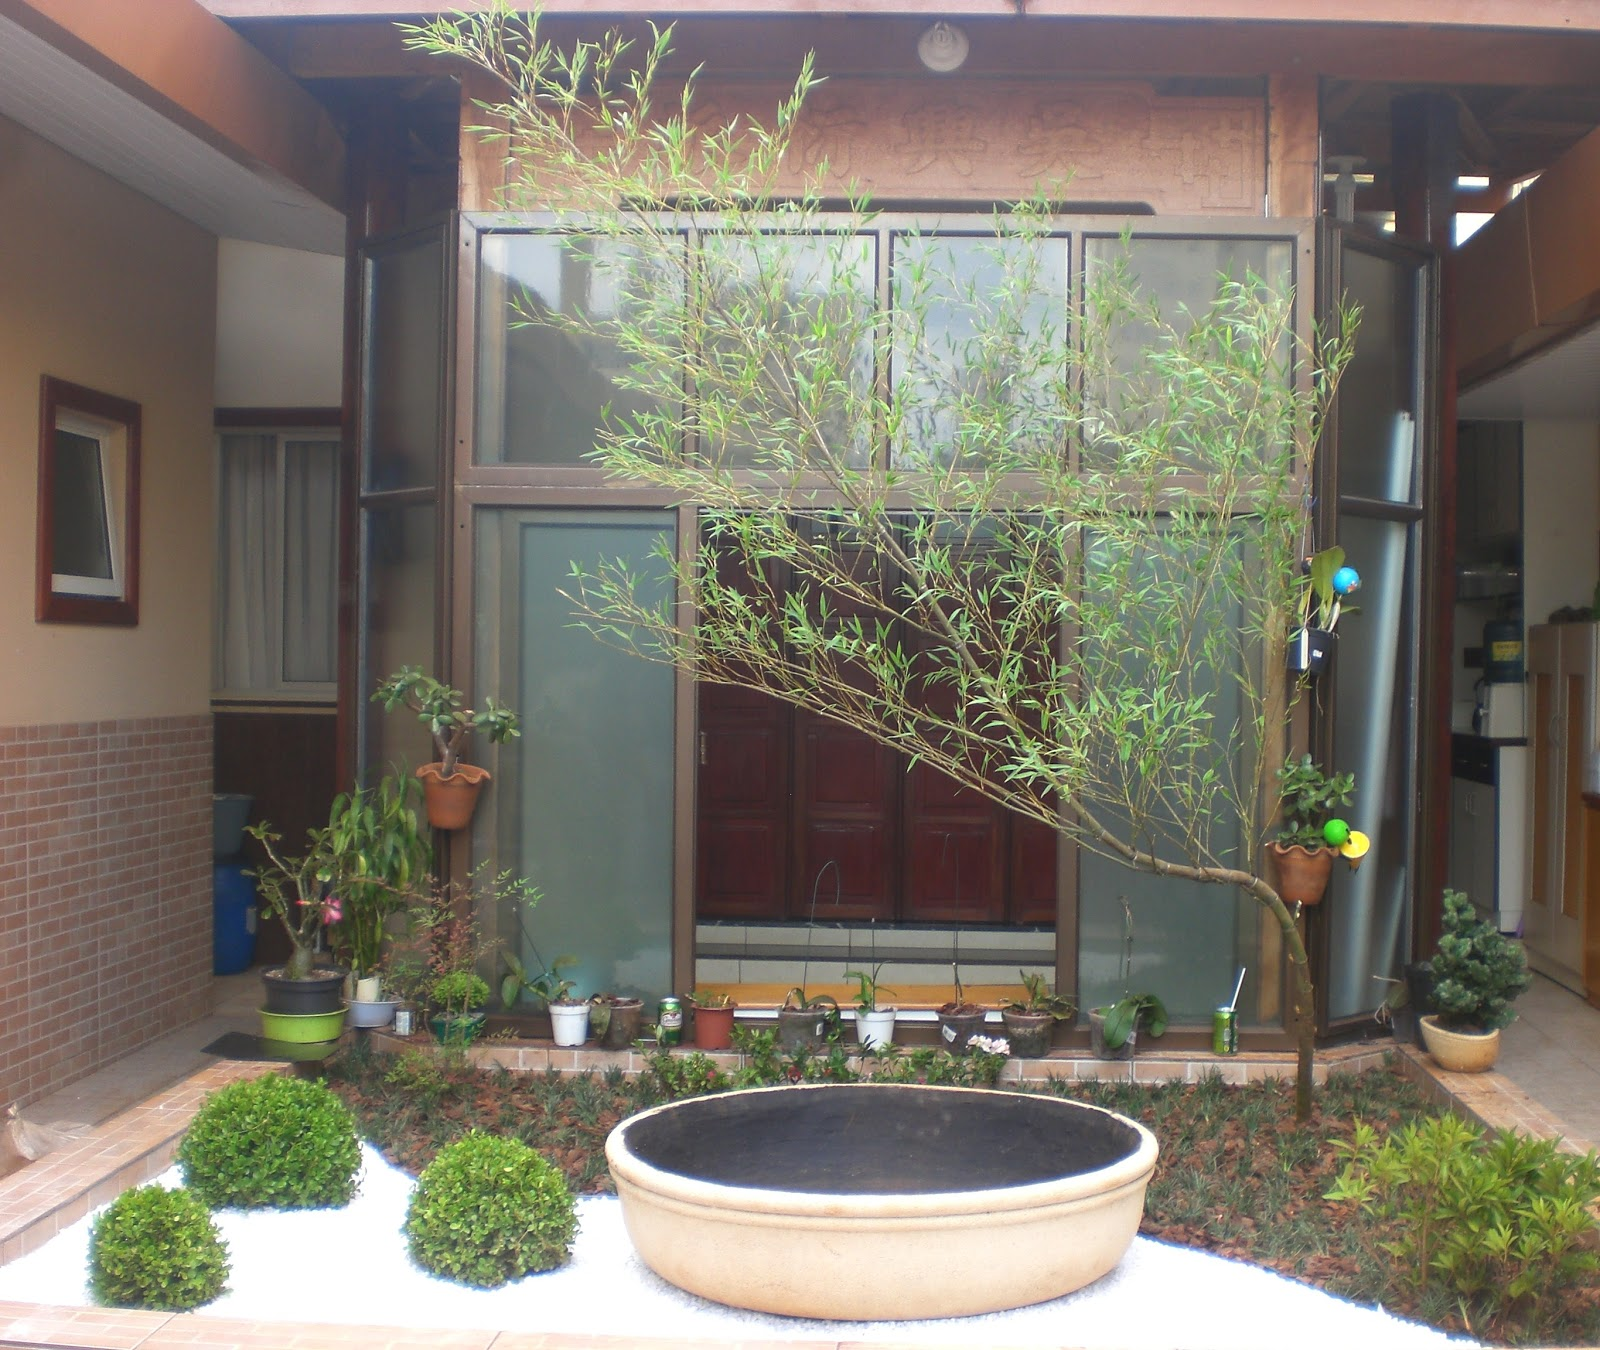 plantas para jardim orientaloriental, todos os elementos usados são